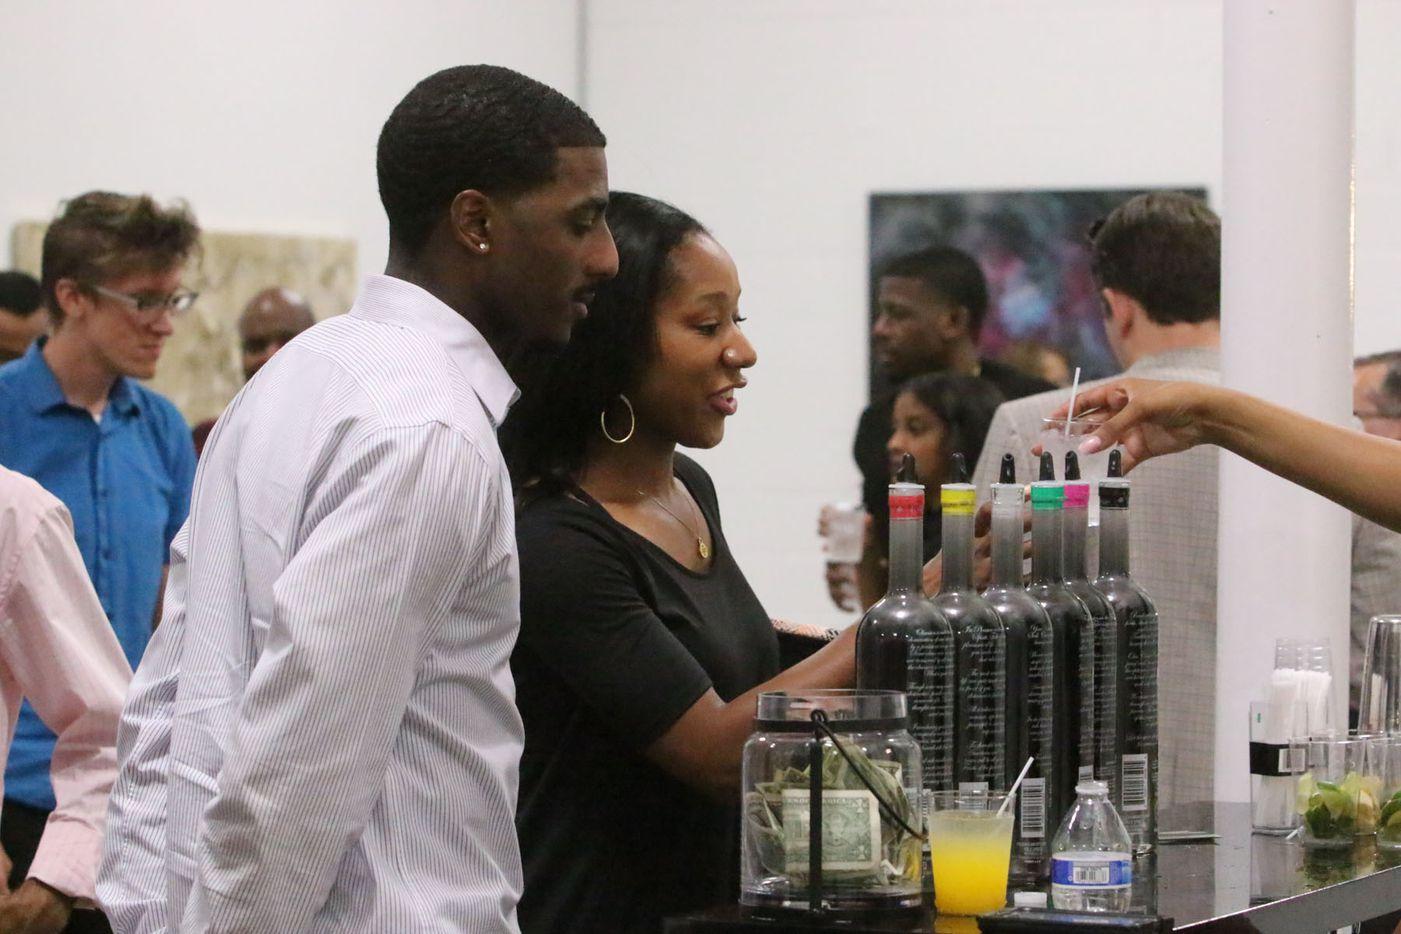 Random Art Gallery hosted the opening reception of visual artist Tori Martin's Euphoria art exhibit.